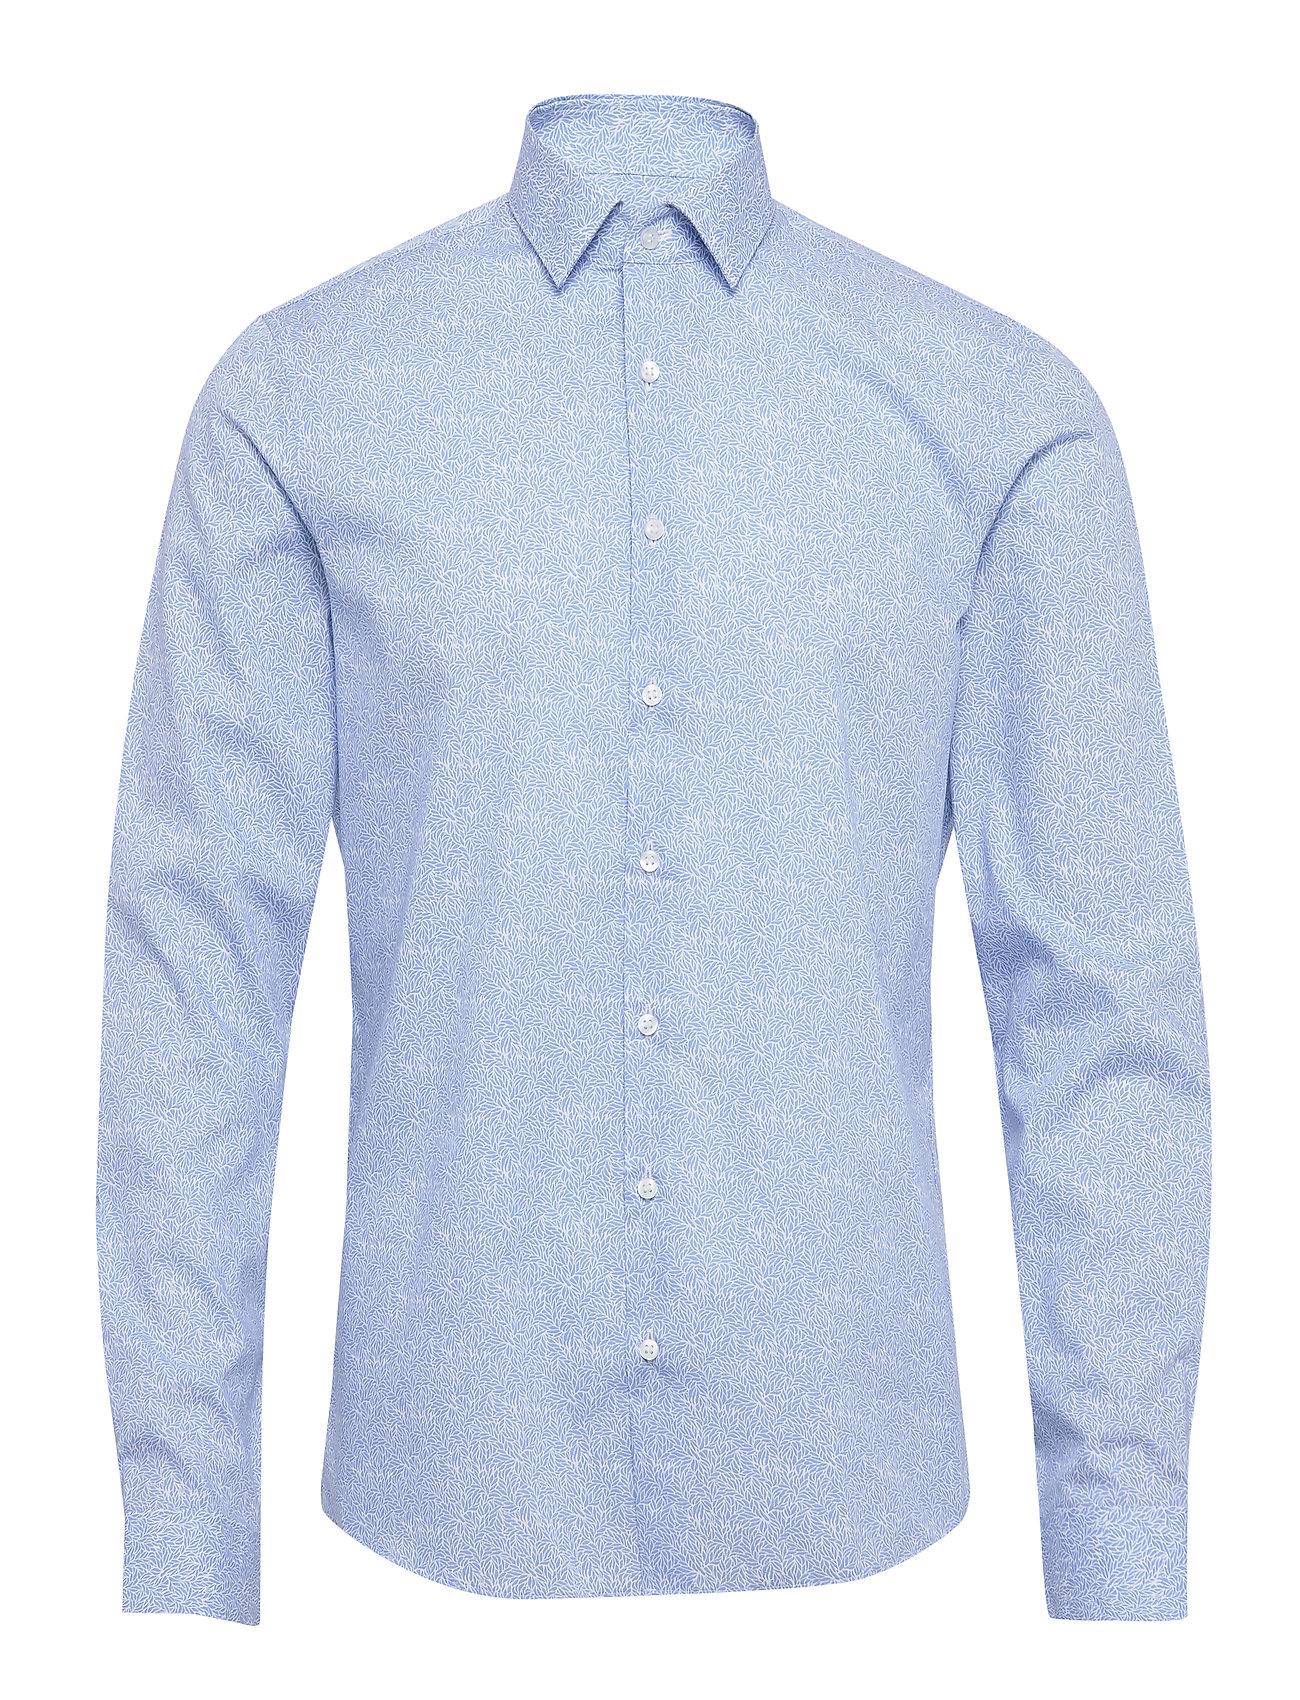 Calvin Klein PRINTED EASY IRON SL - LIGHT BLUE